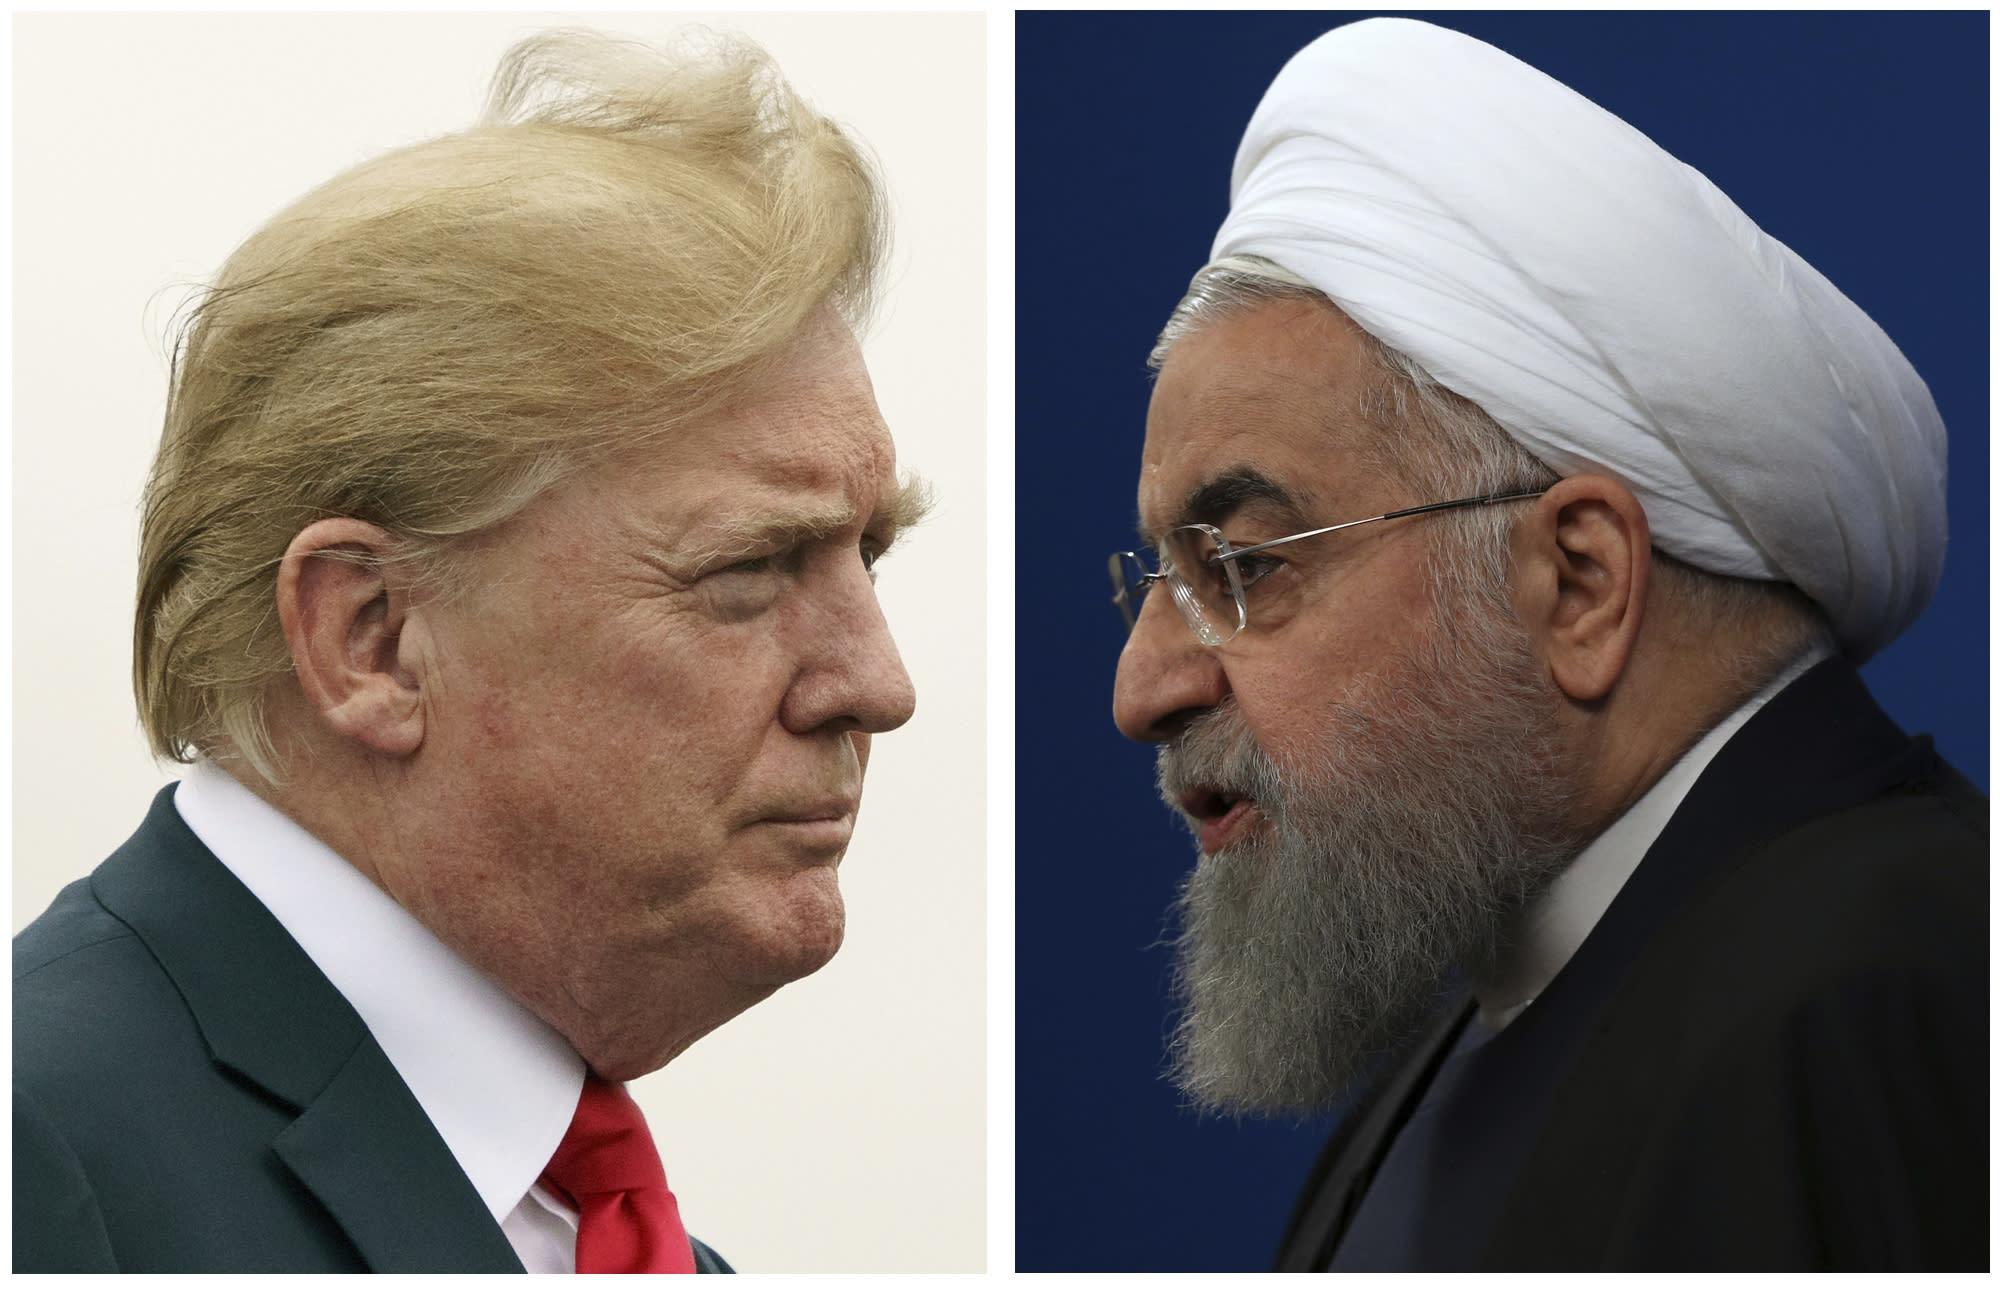 Just tough Trump tweeting? US ratchets up Iran pressure on